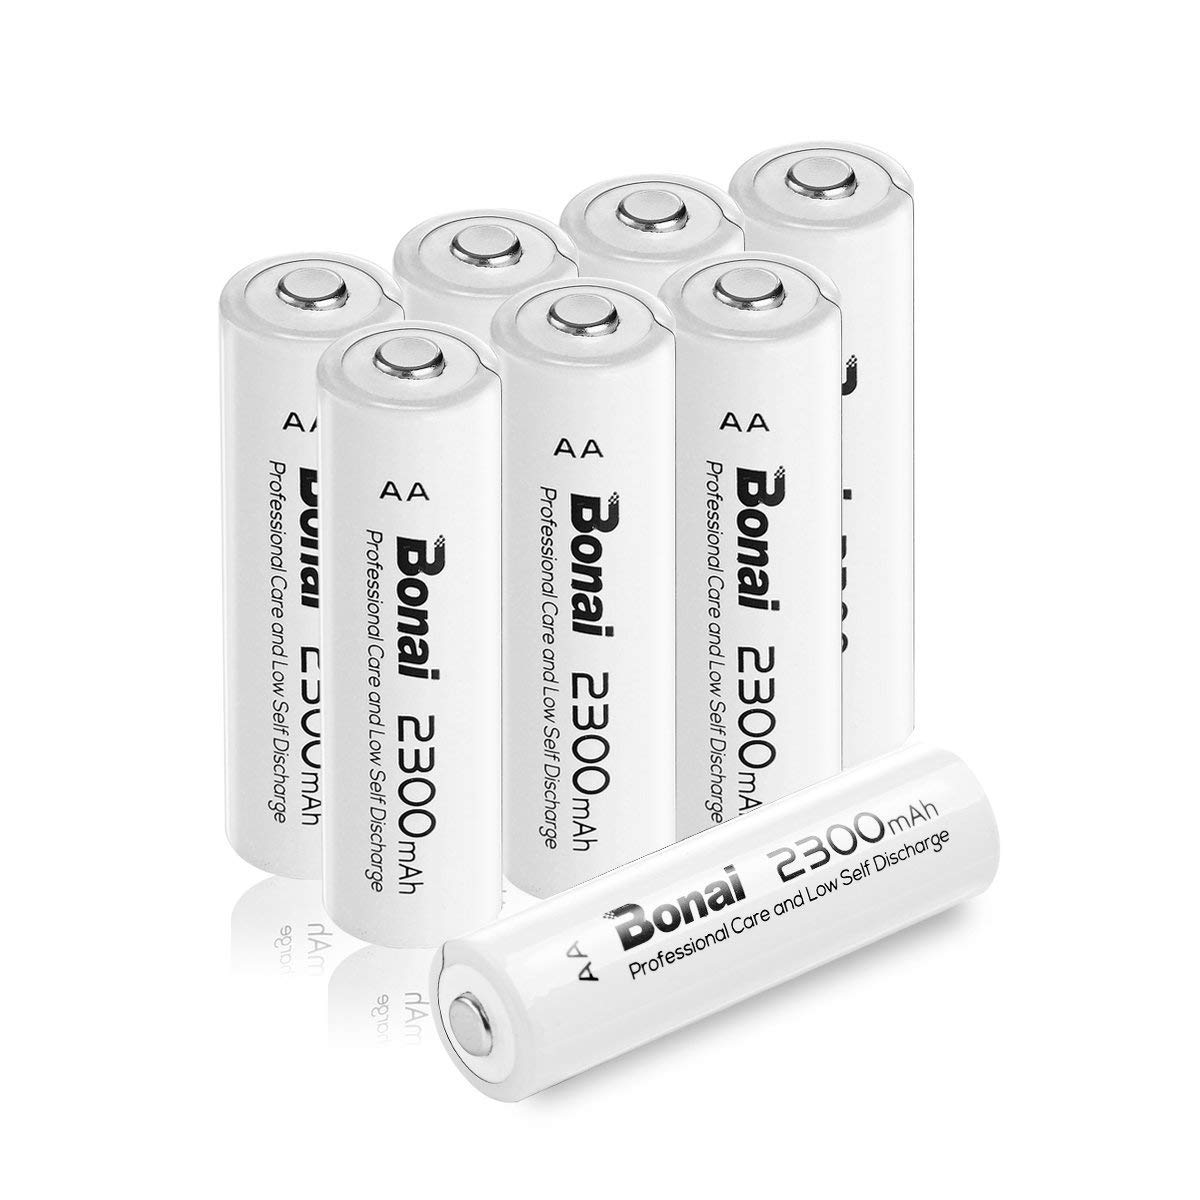 Bonai AA Rechargeable Batteries 16 Pack 2300mAh 1.2V Ni-MH High Capacity - UL Certificate BN2A170802C016-CA